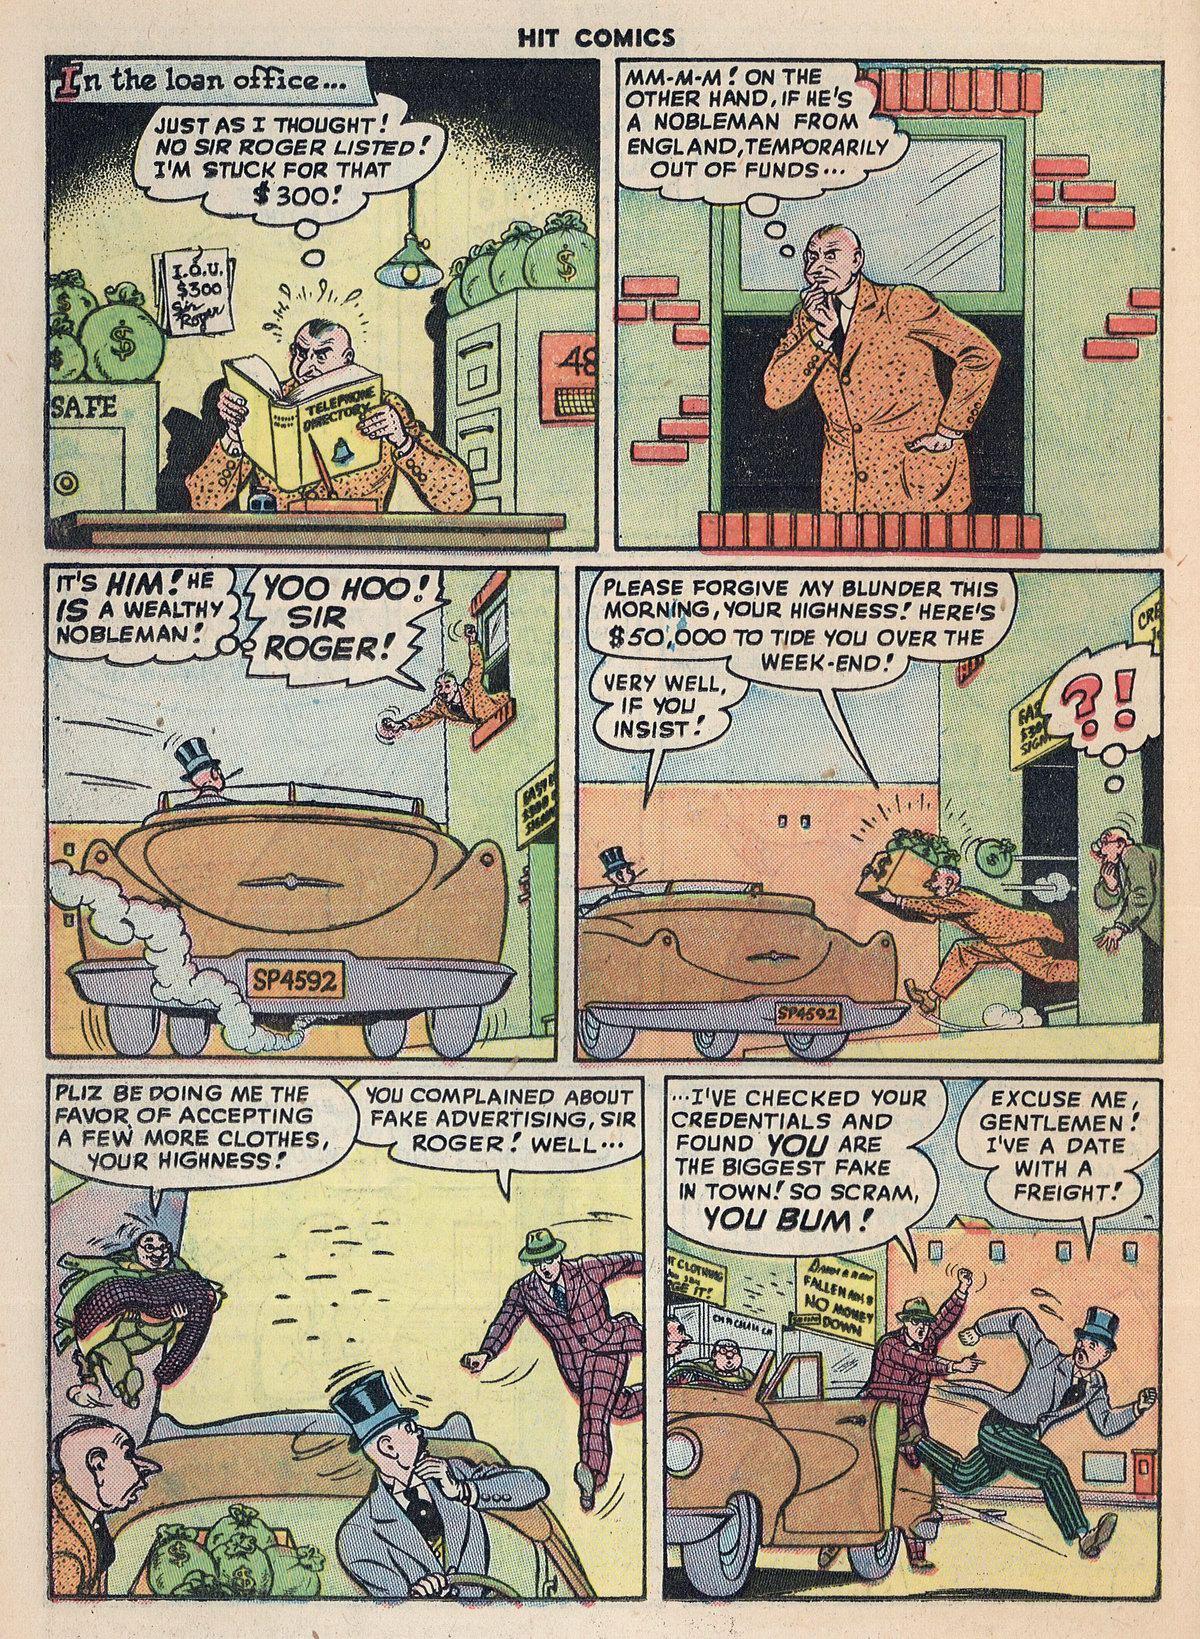 Read online Hit Comics comic -  Issue #55 - 36